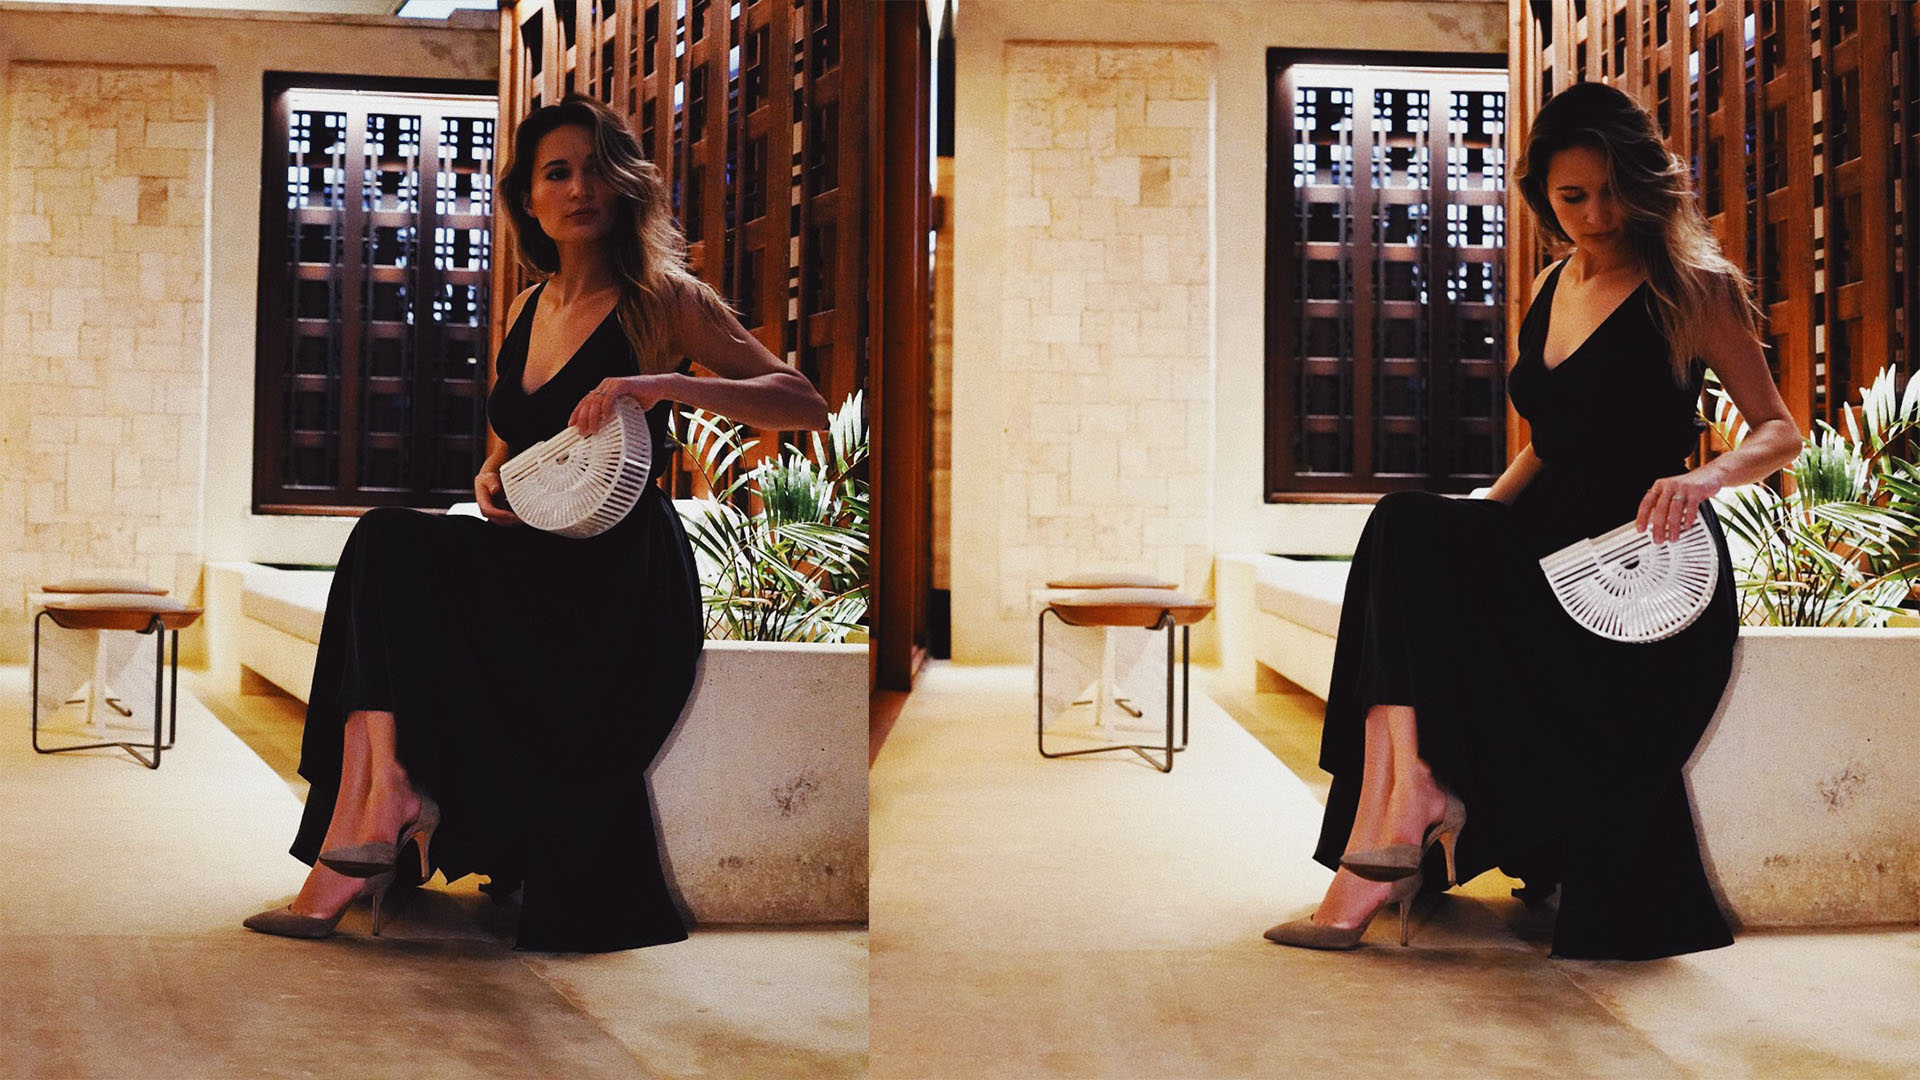 DRESS -   & OTHER STORIES     BAG -   CULT GAIA     HEELS -  VINCE